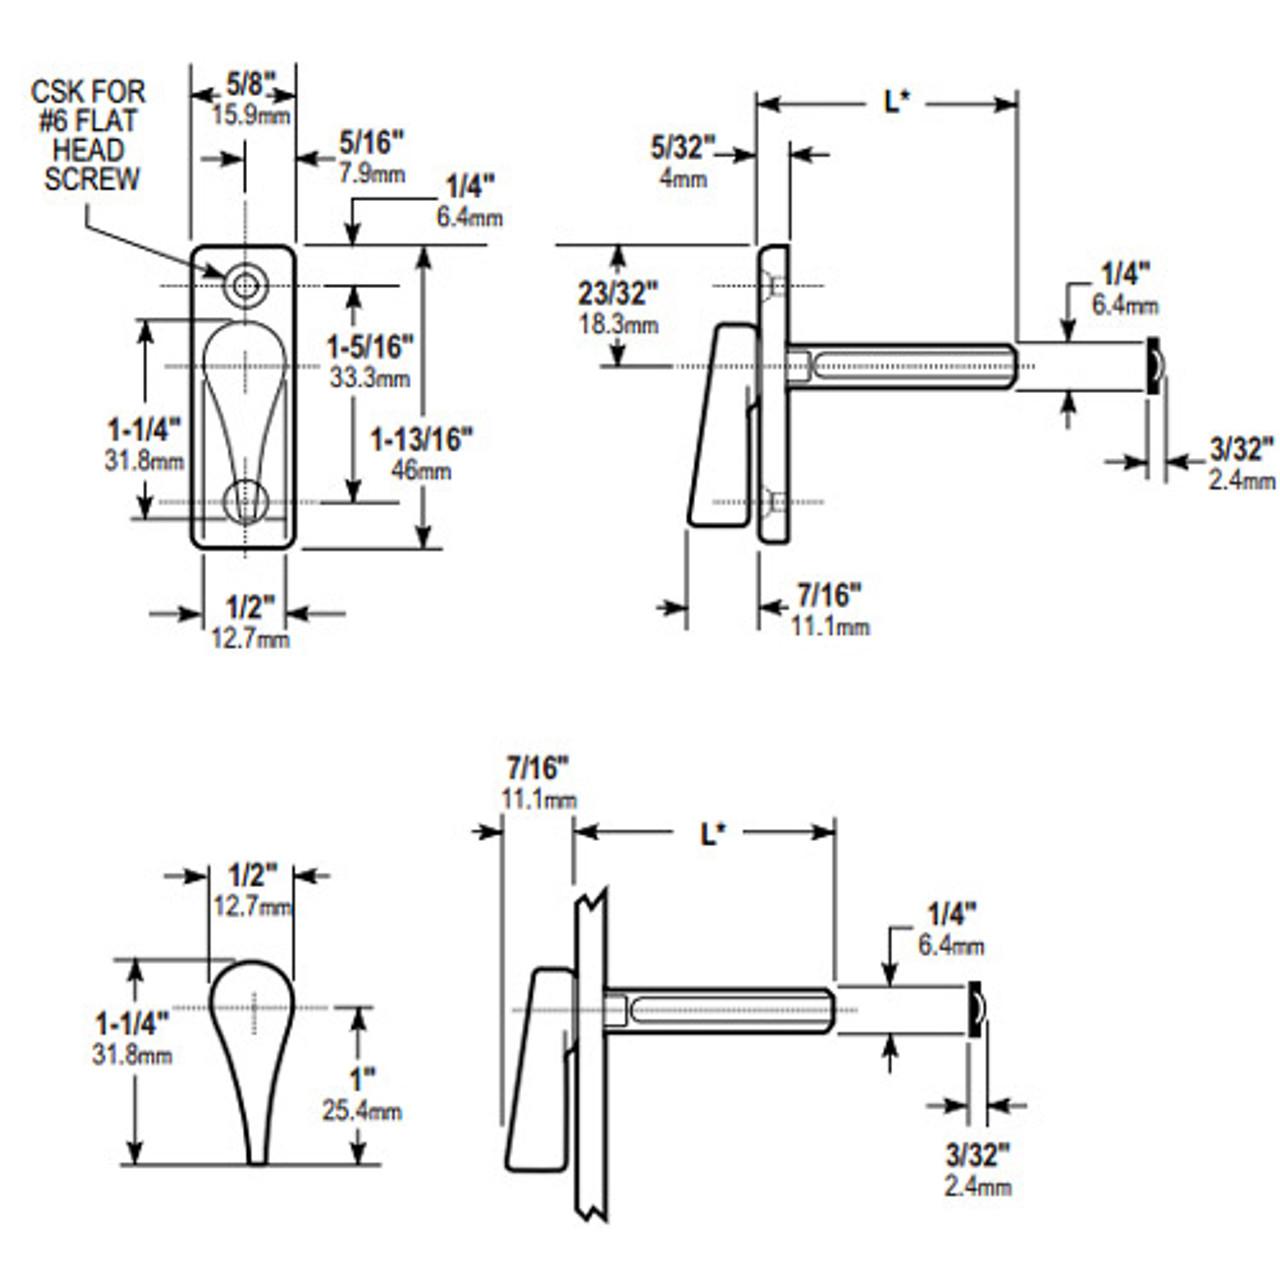 1000-02-13-121 Adams Rite 1000 Series Turns Dimensional View